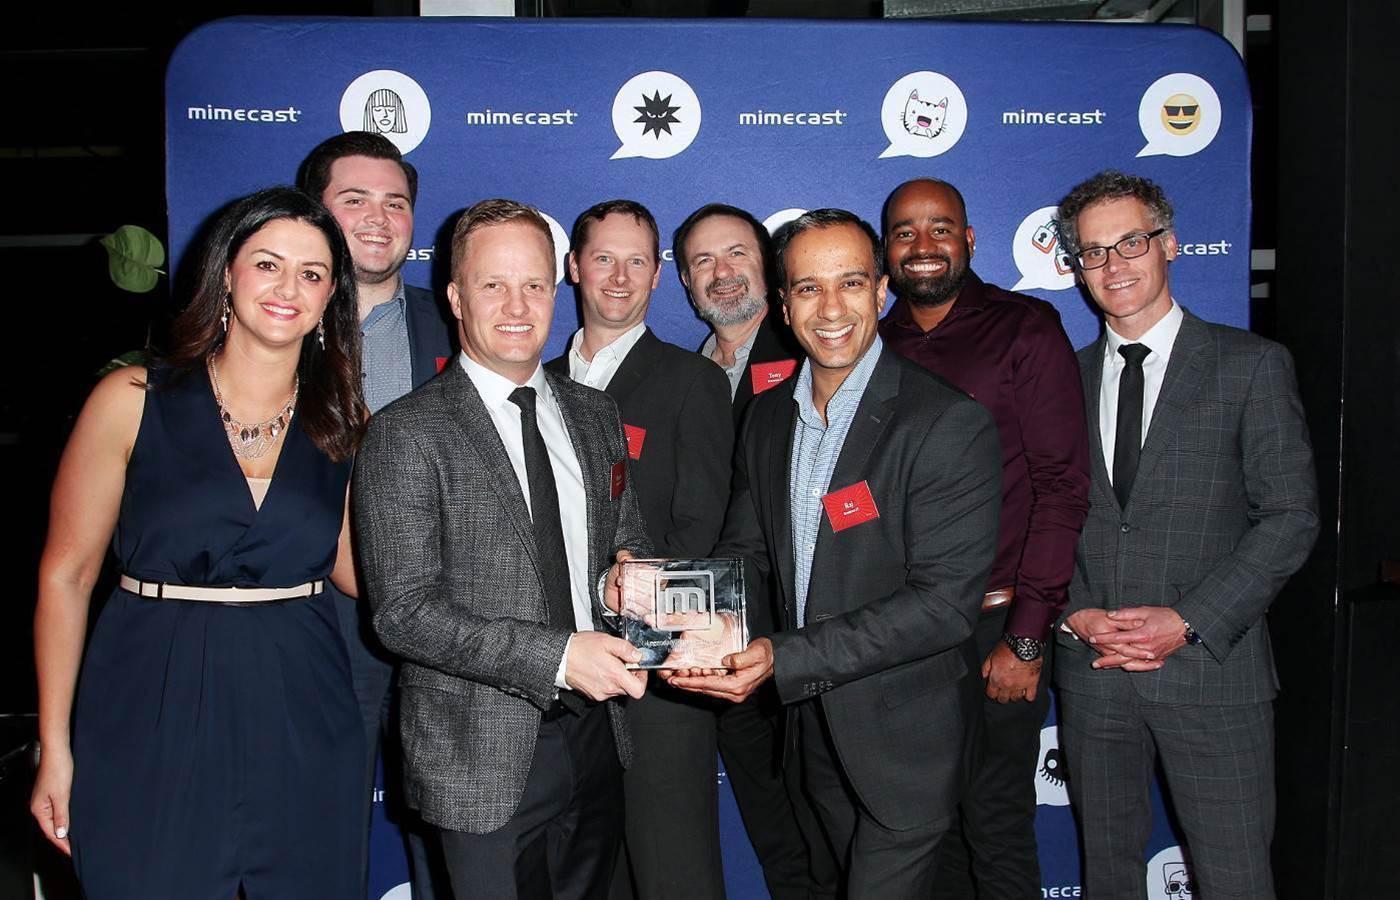 Brennan IT, Dimension Data and Data#3 headline Mimecast's 2018 partner awards